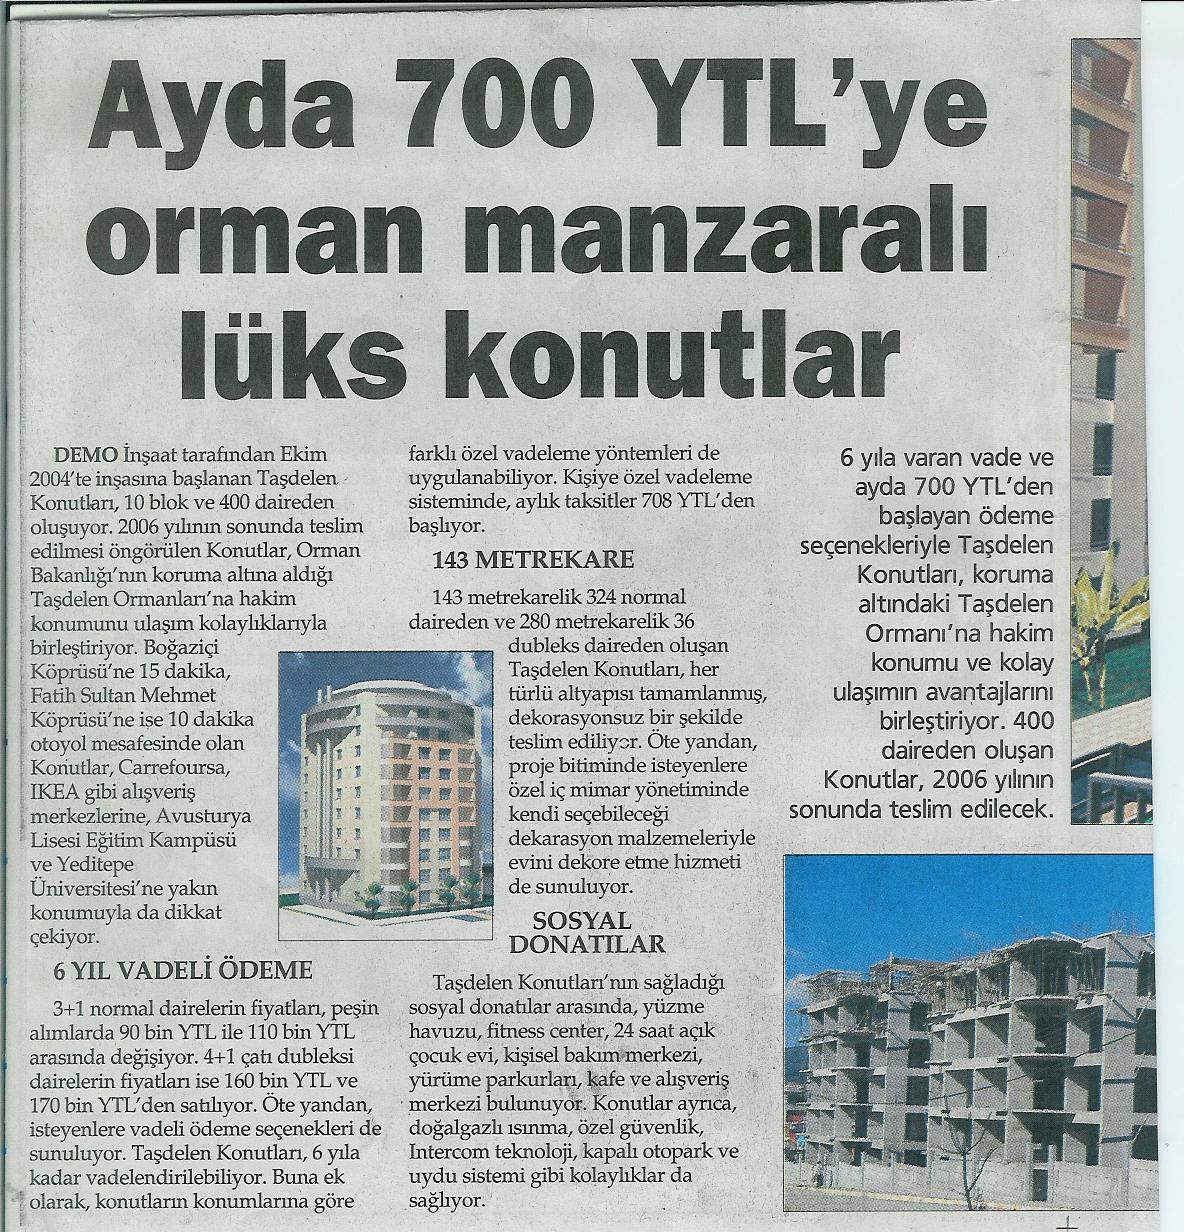 Hürriyet_Emlak_Ya_am_Eki_31_Mart_2005.jpg